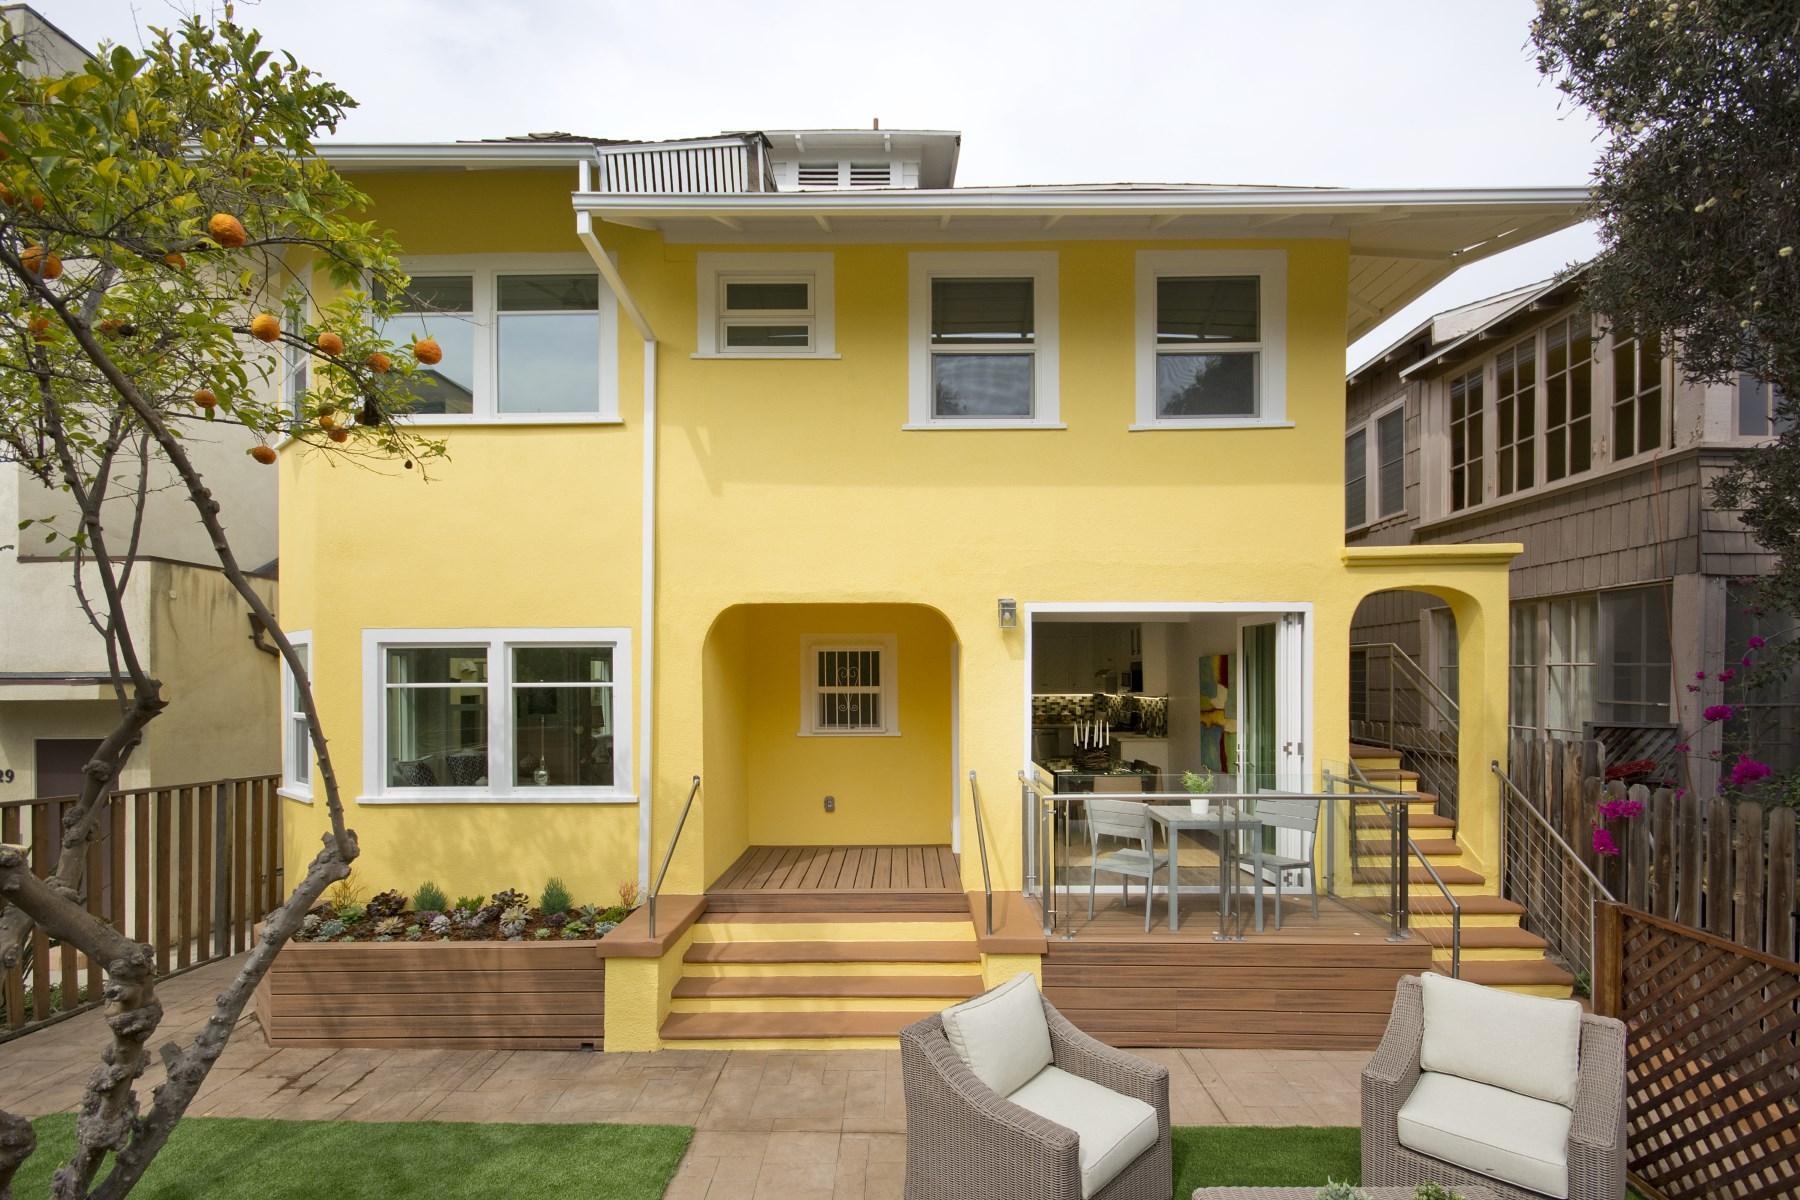 Apartamentos multi-familiares para Venda às Fabulous Tri-plex in Venice 31 Breeze Ave Venice, Califórnia, 90291 Estados Unidos